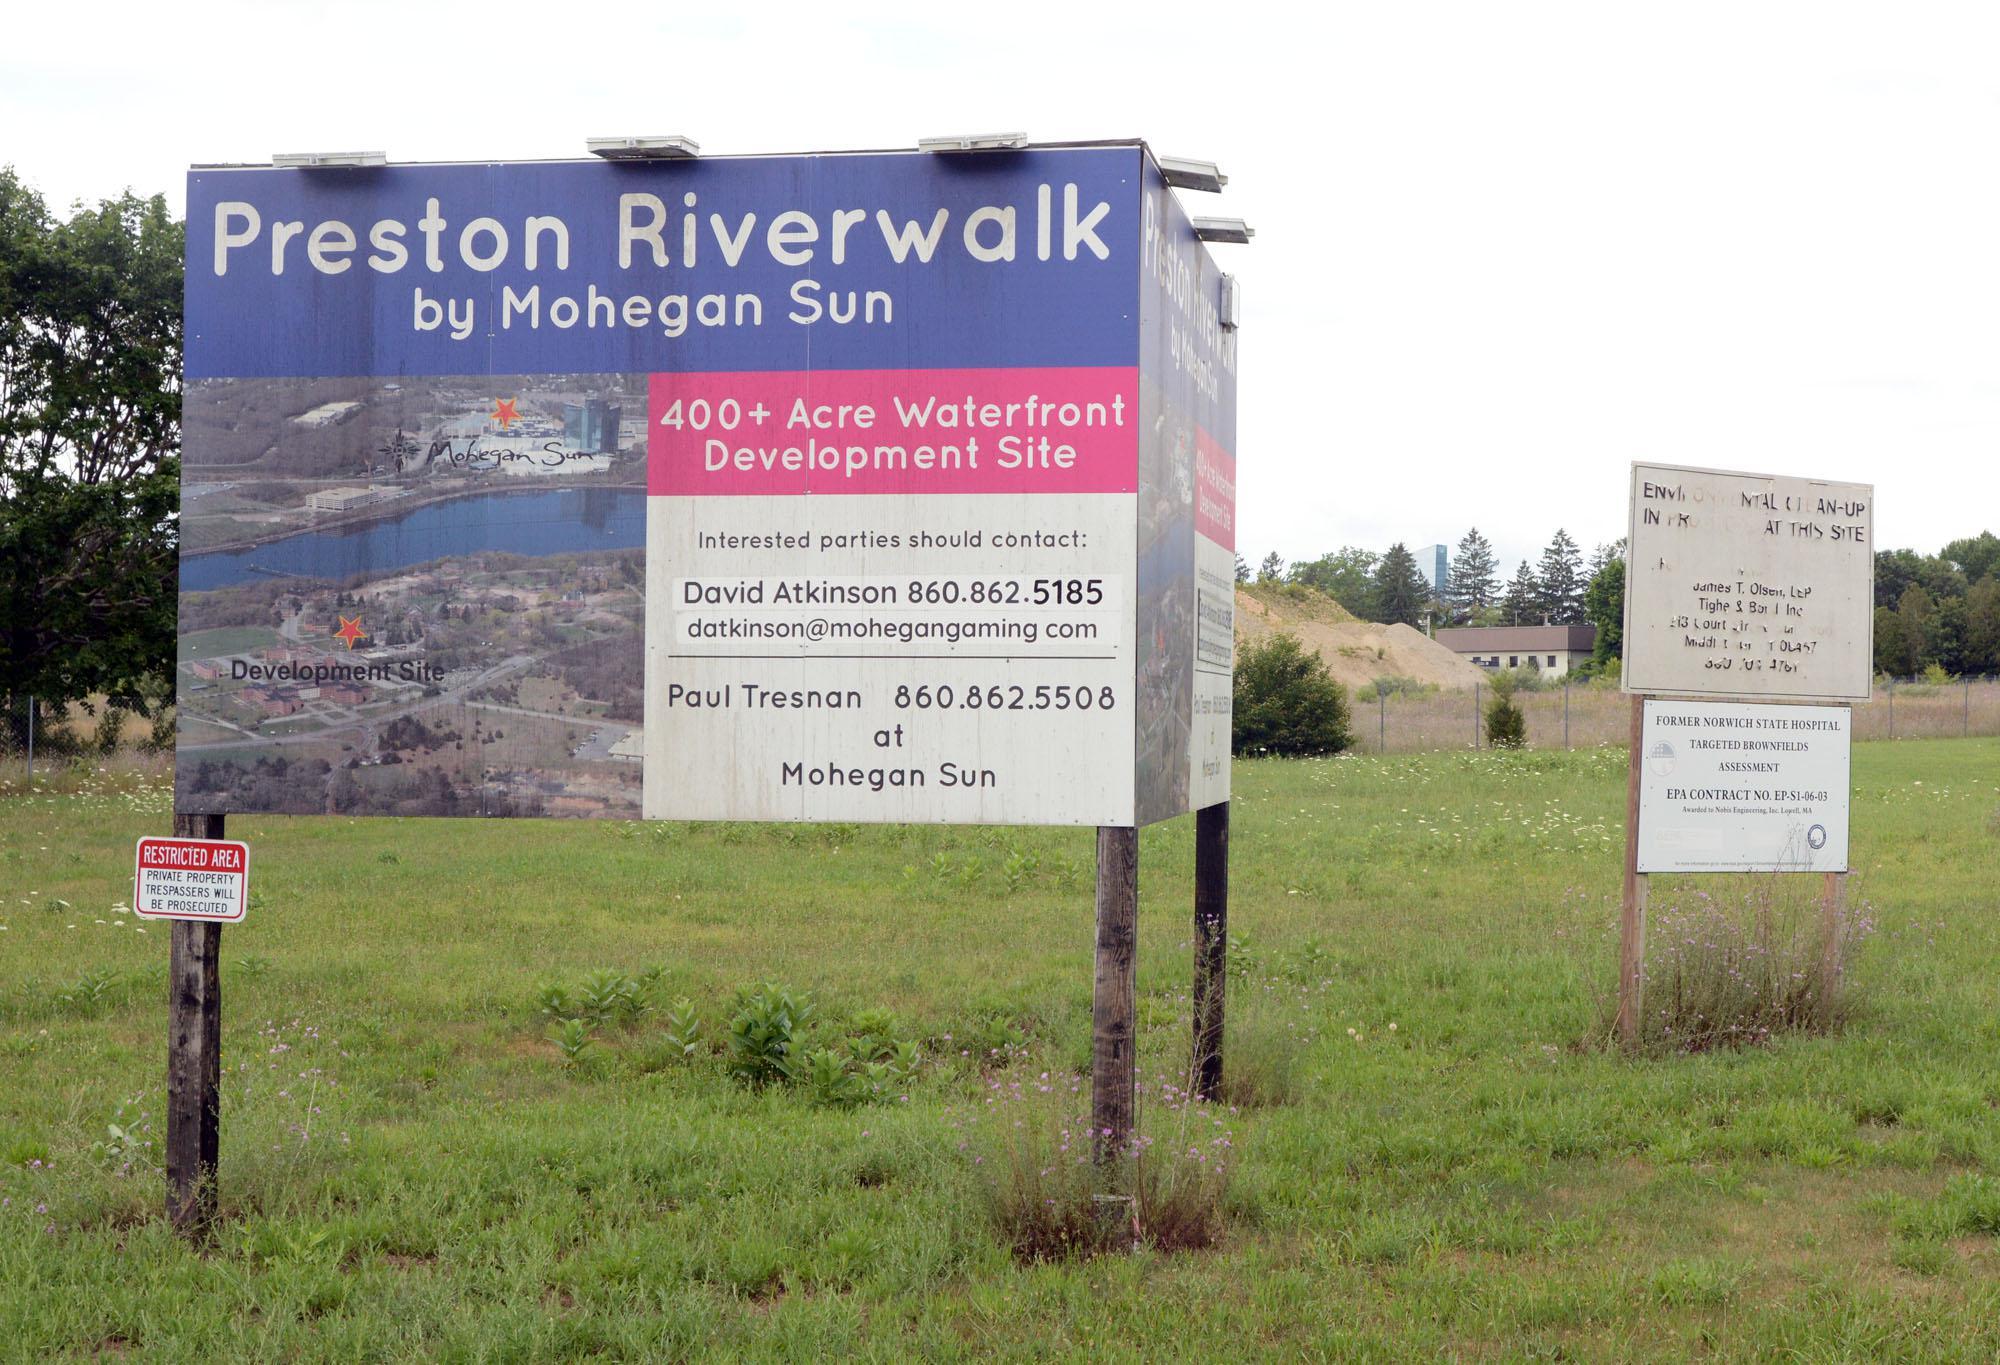 File photo of the Preston Riverwalk sign.